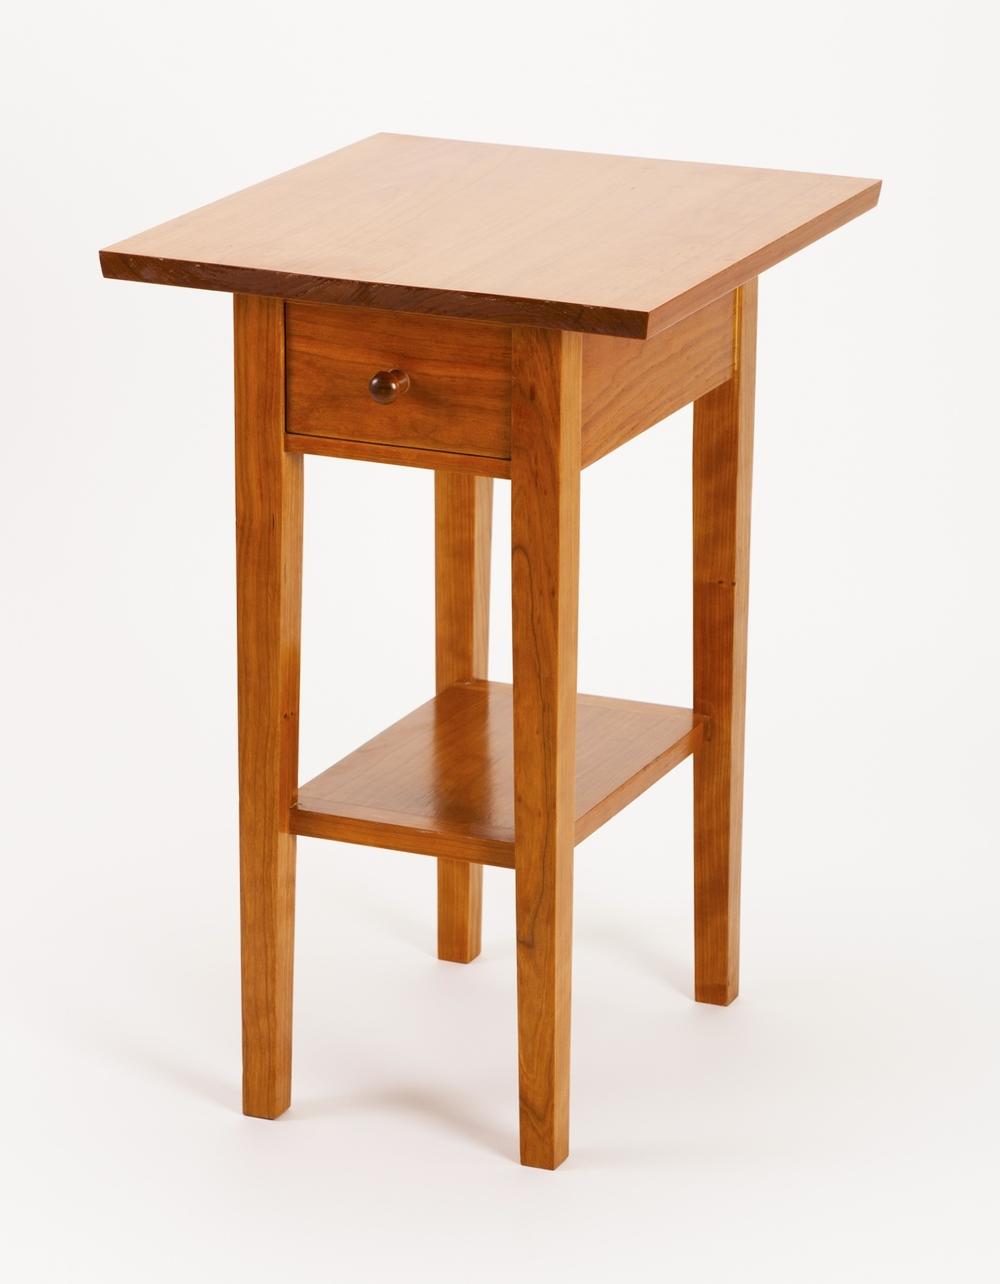 Furniture004.jpg